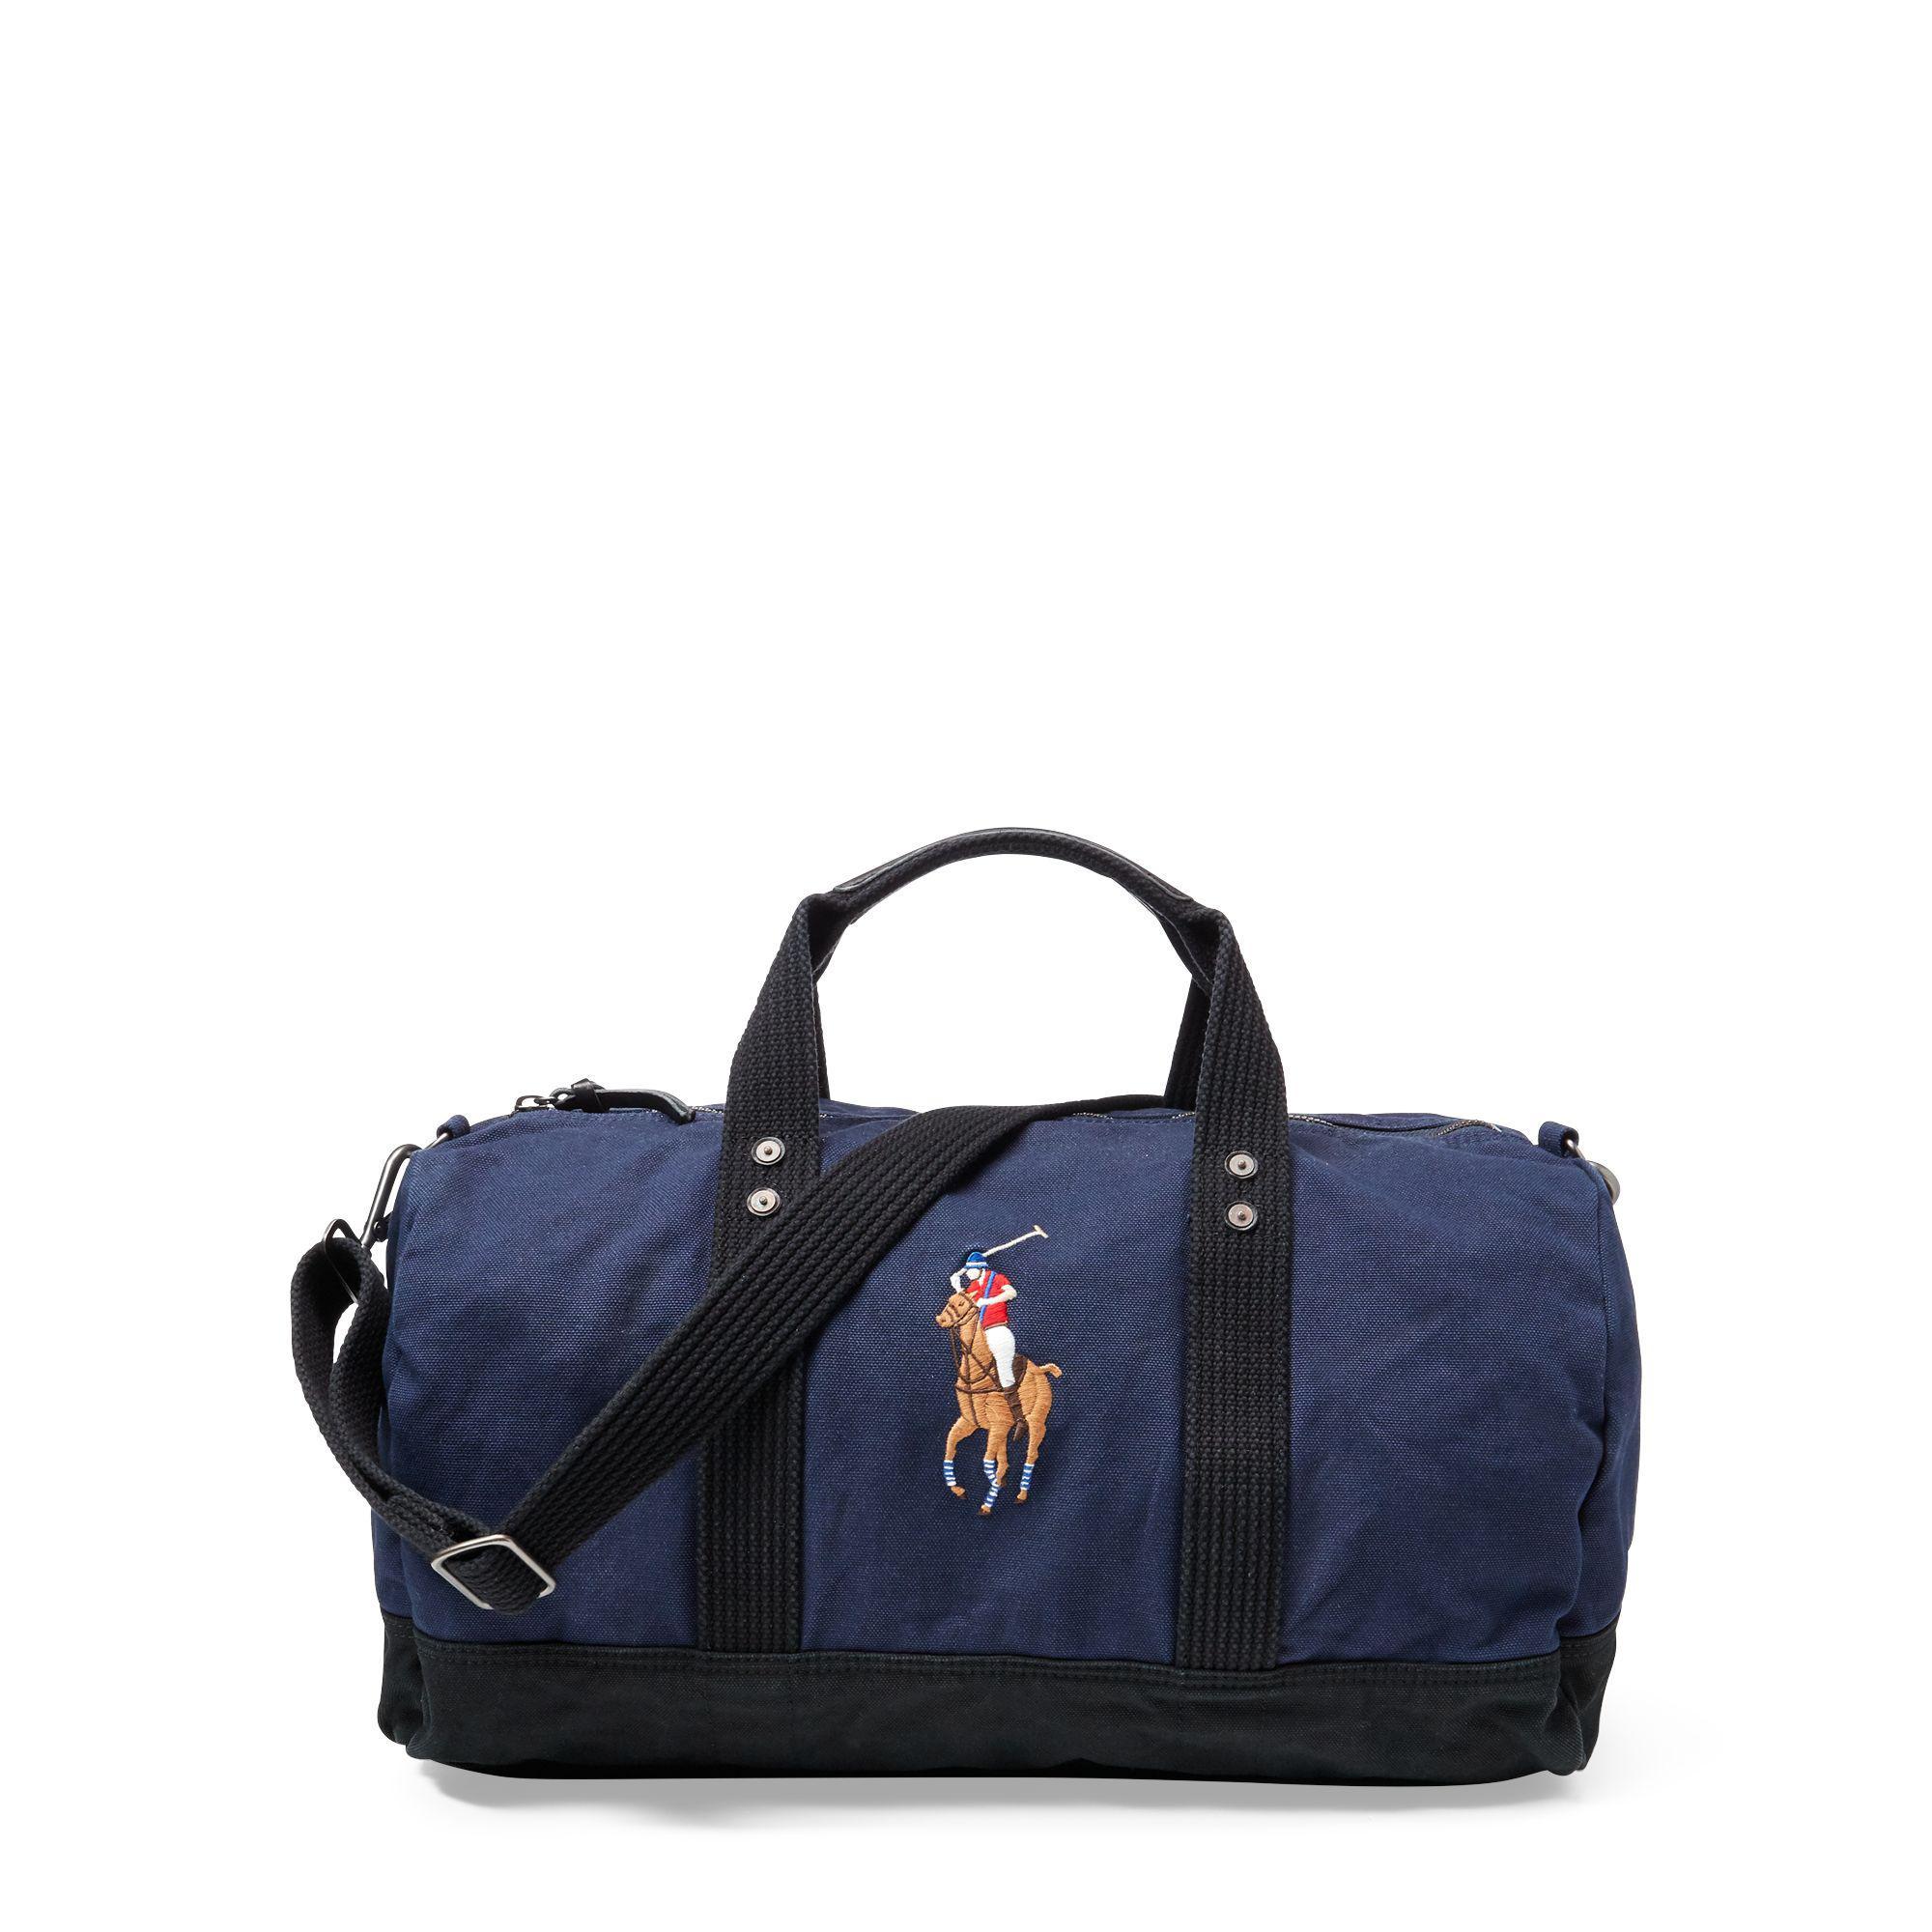 Lyst - Polo Ralph Lauren Canvas Big Pony Duffel Bag in Blue for Men 1695793e6d